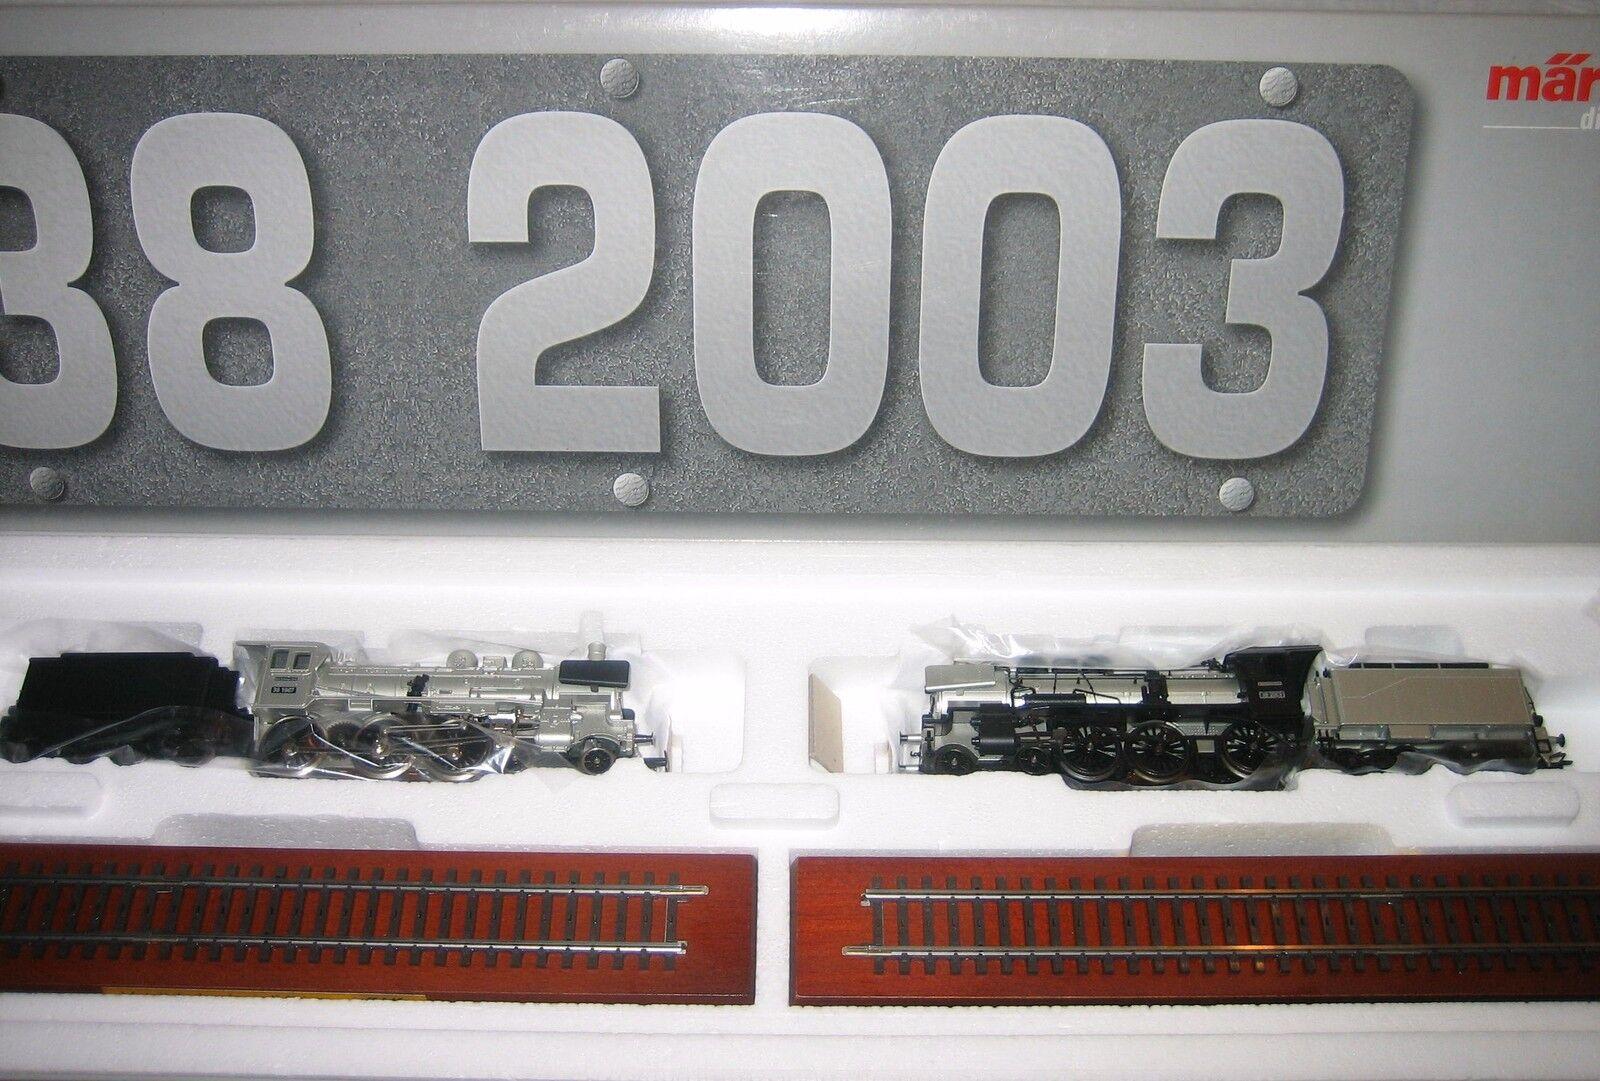 Märklin H0 38 2003 Steam Locomotive Train Set Technology New Condition Original